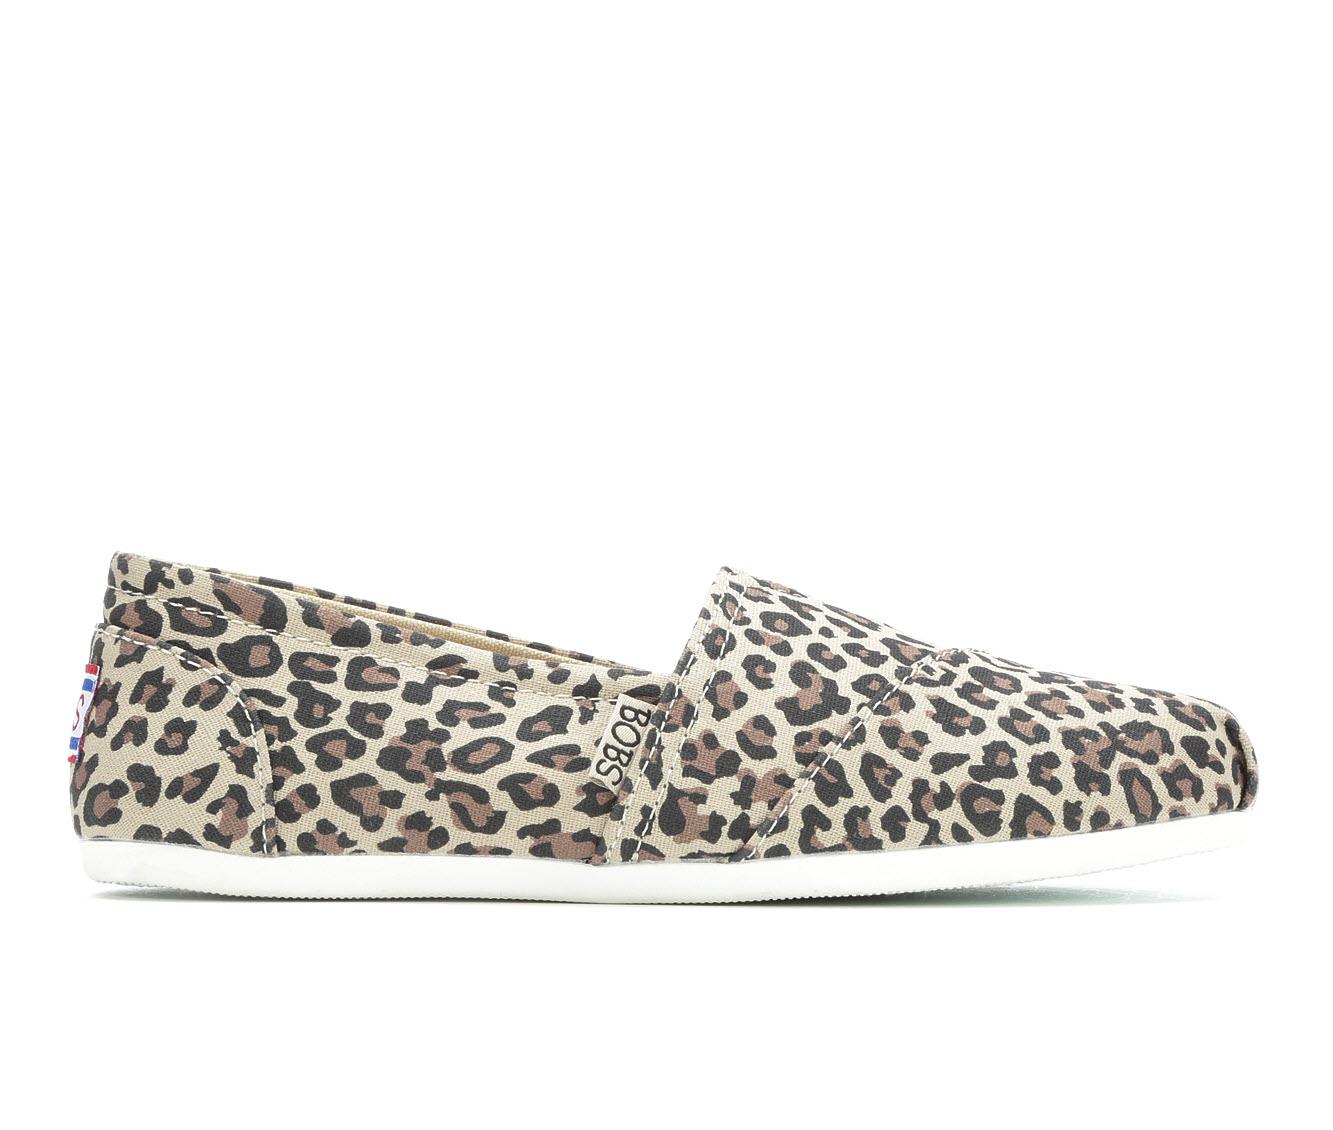 BOBS Hot Spotted 33417 Women's Shoe (Beige Canvas)